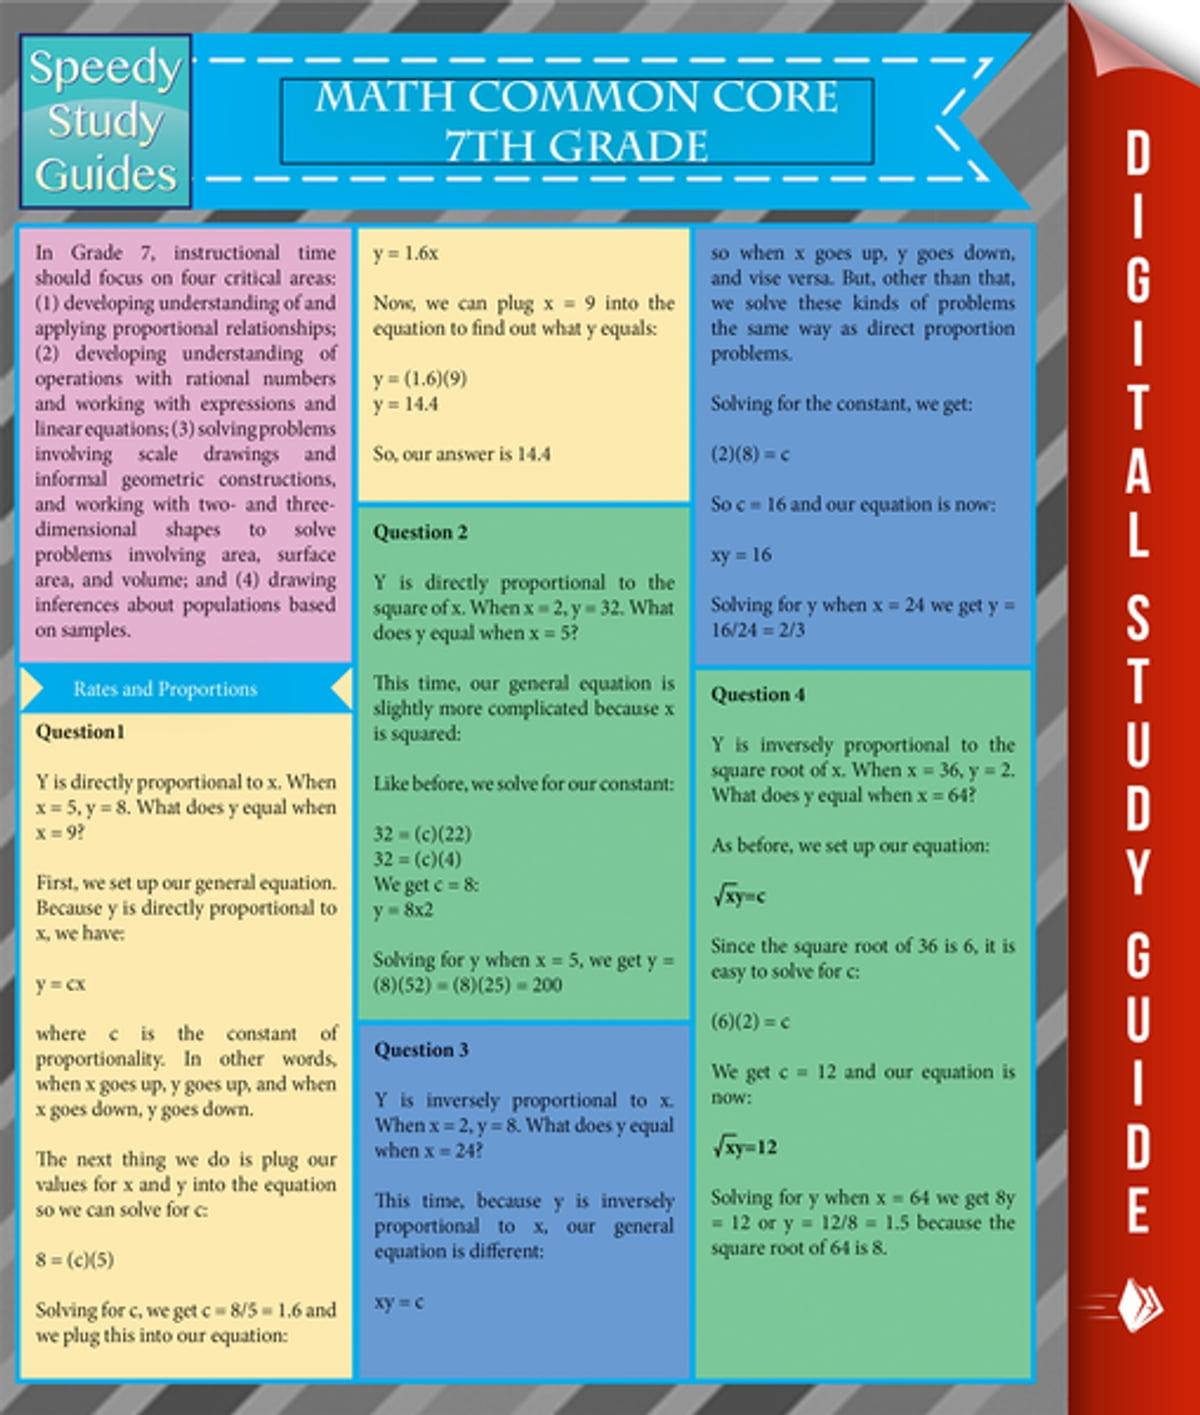 Math Common Core 7th Grade Speedy Study Guides Ebook By